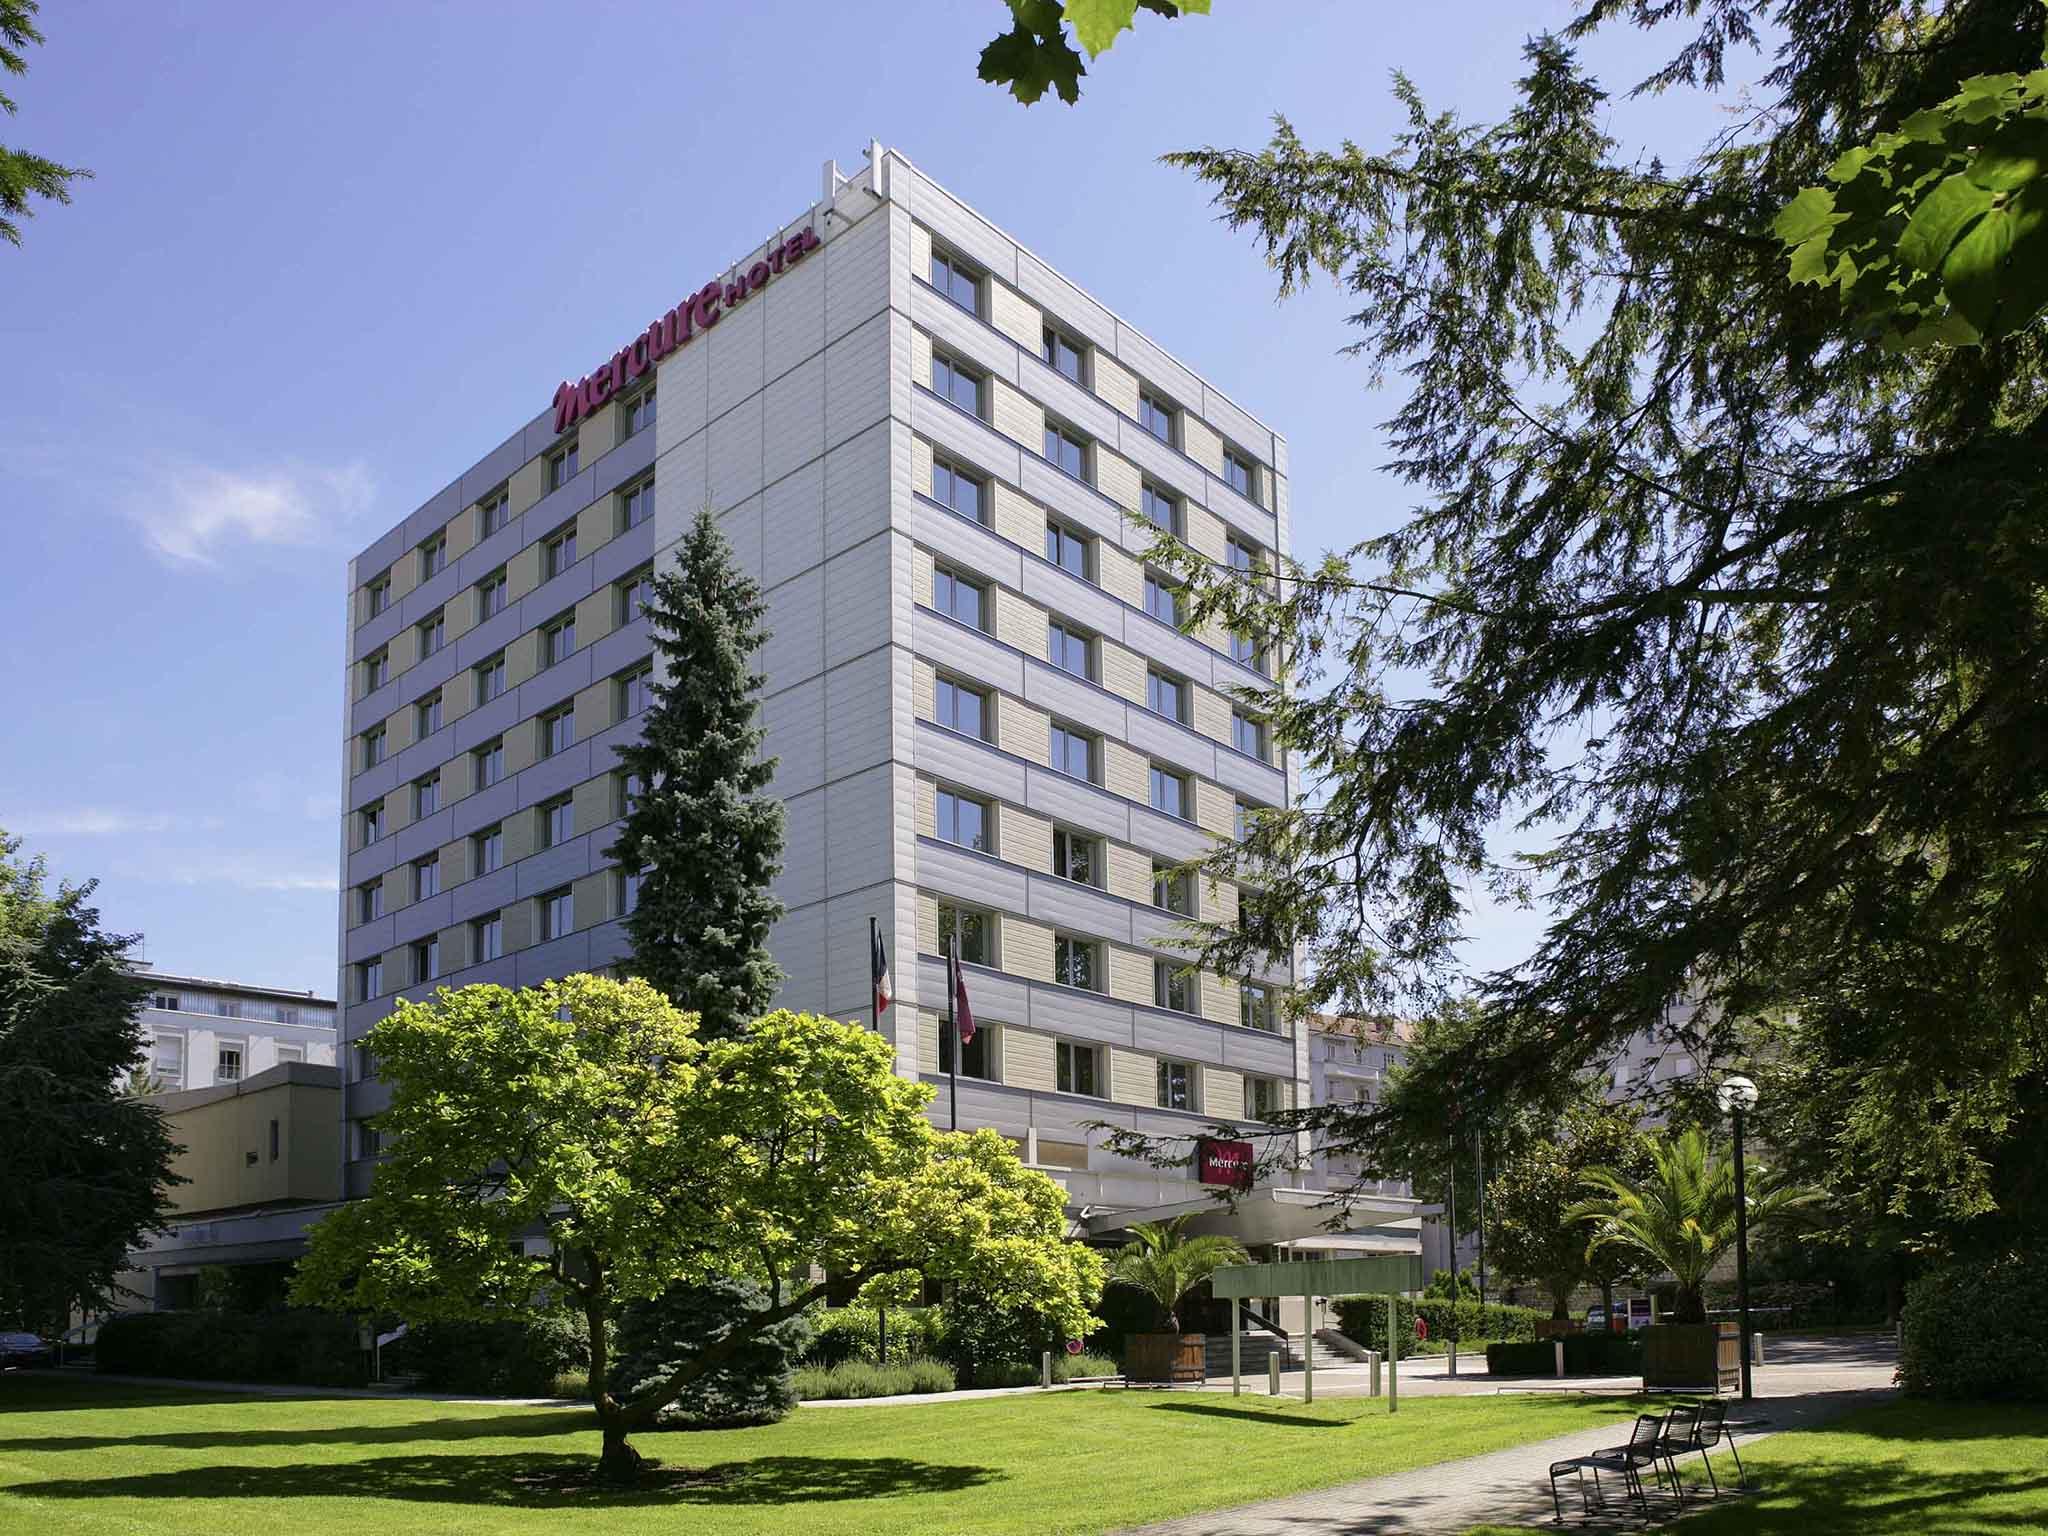 Hotel – Hotel Mercure Besancon Parc Micaud